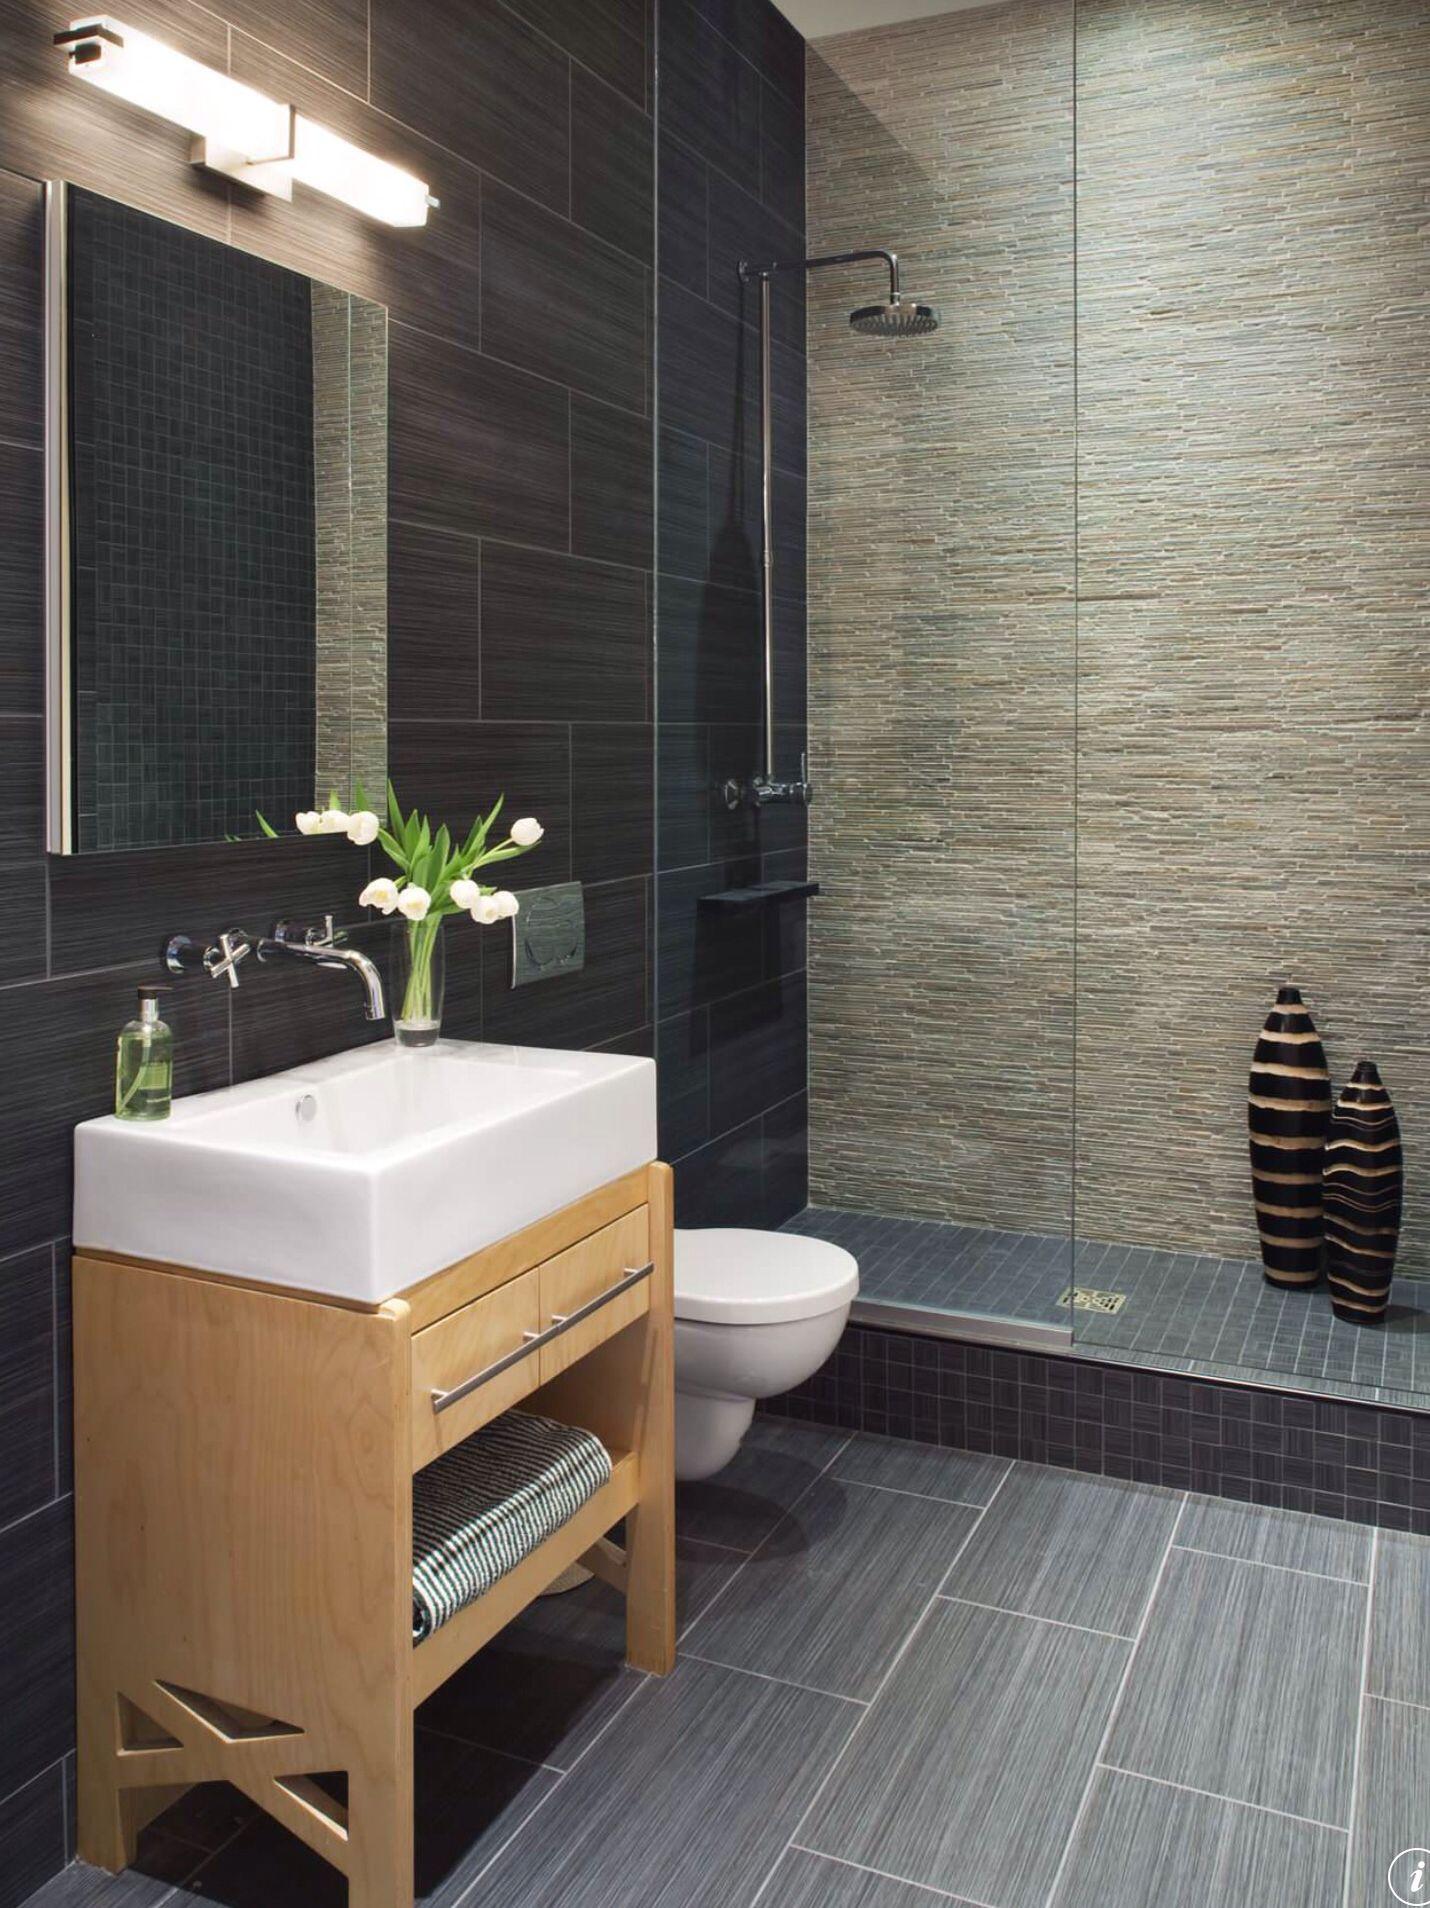 Simple Modern Design Of Bathroom Bathroom Design Small